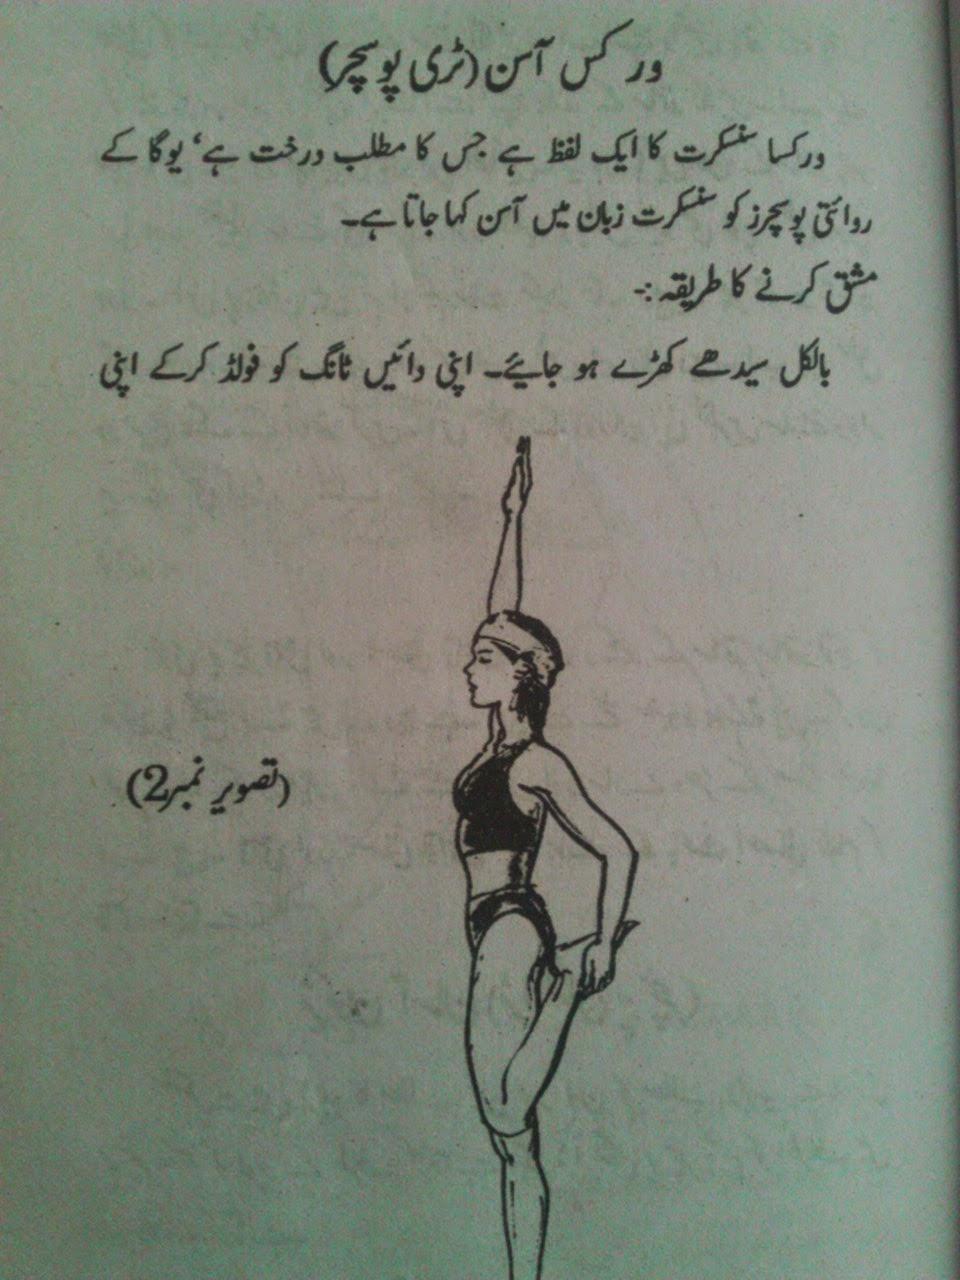 Learn yoga in urdu language yoga in urdu yoga in urdu yoga asanas in urdu yoga asanas list yoga asanas weight loss telugu yoga asanas for weight loss yoga asanas for weight ccuart Images